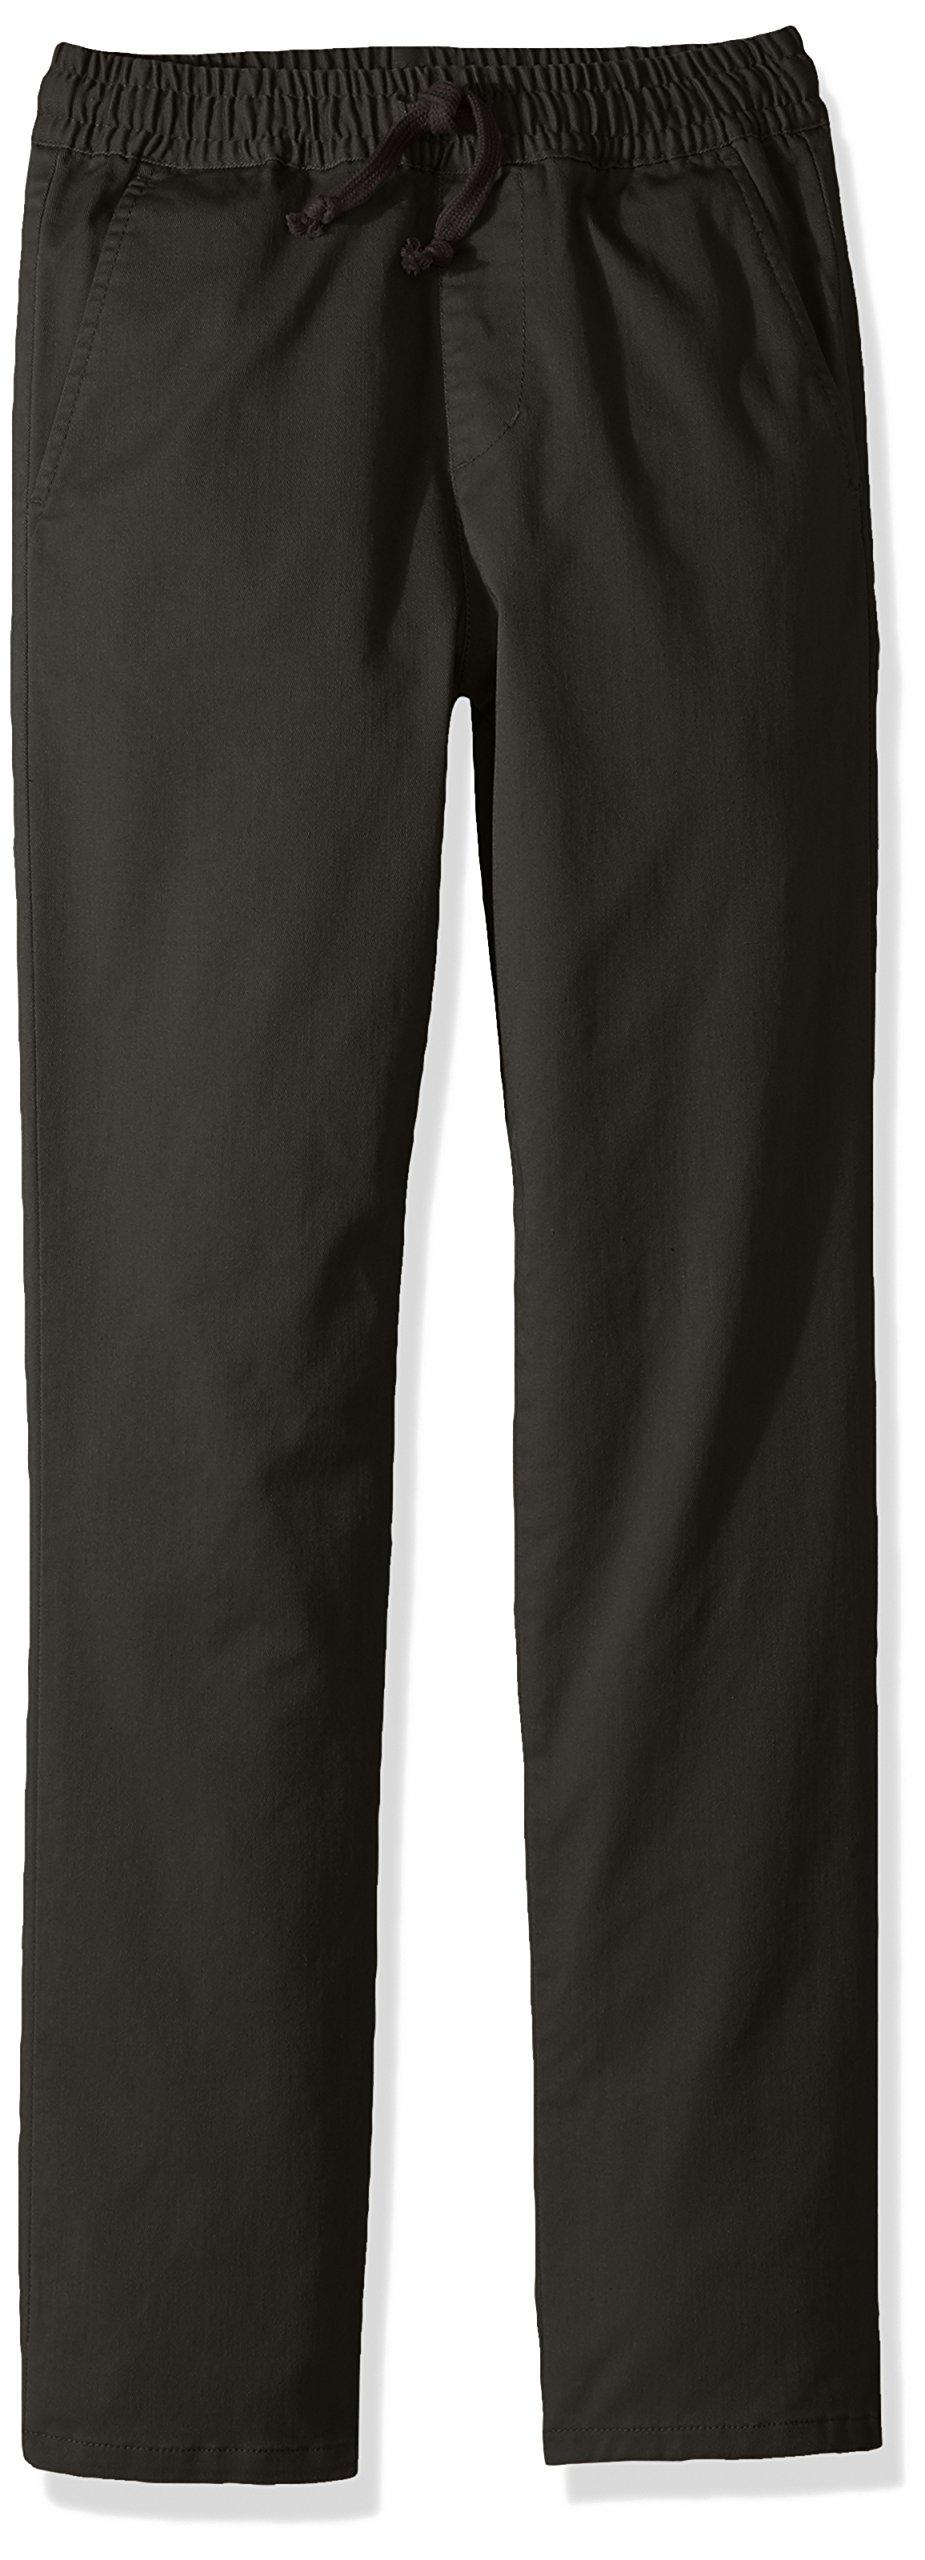 RVCA Boys' Big' A.T. DAYSHIFT Elastic Pant, Pirate Black, XL